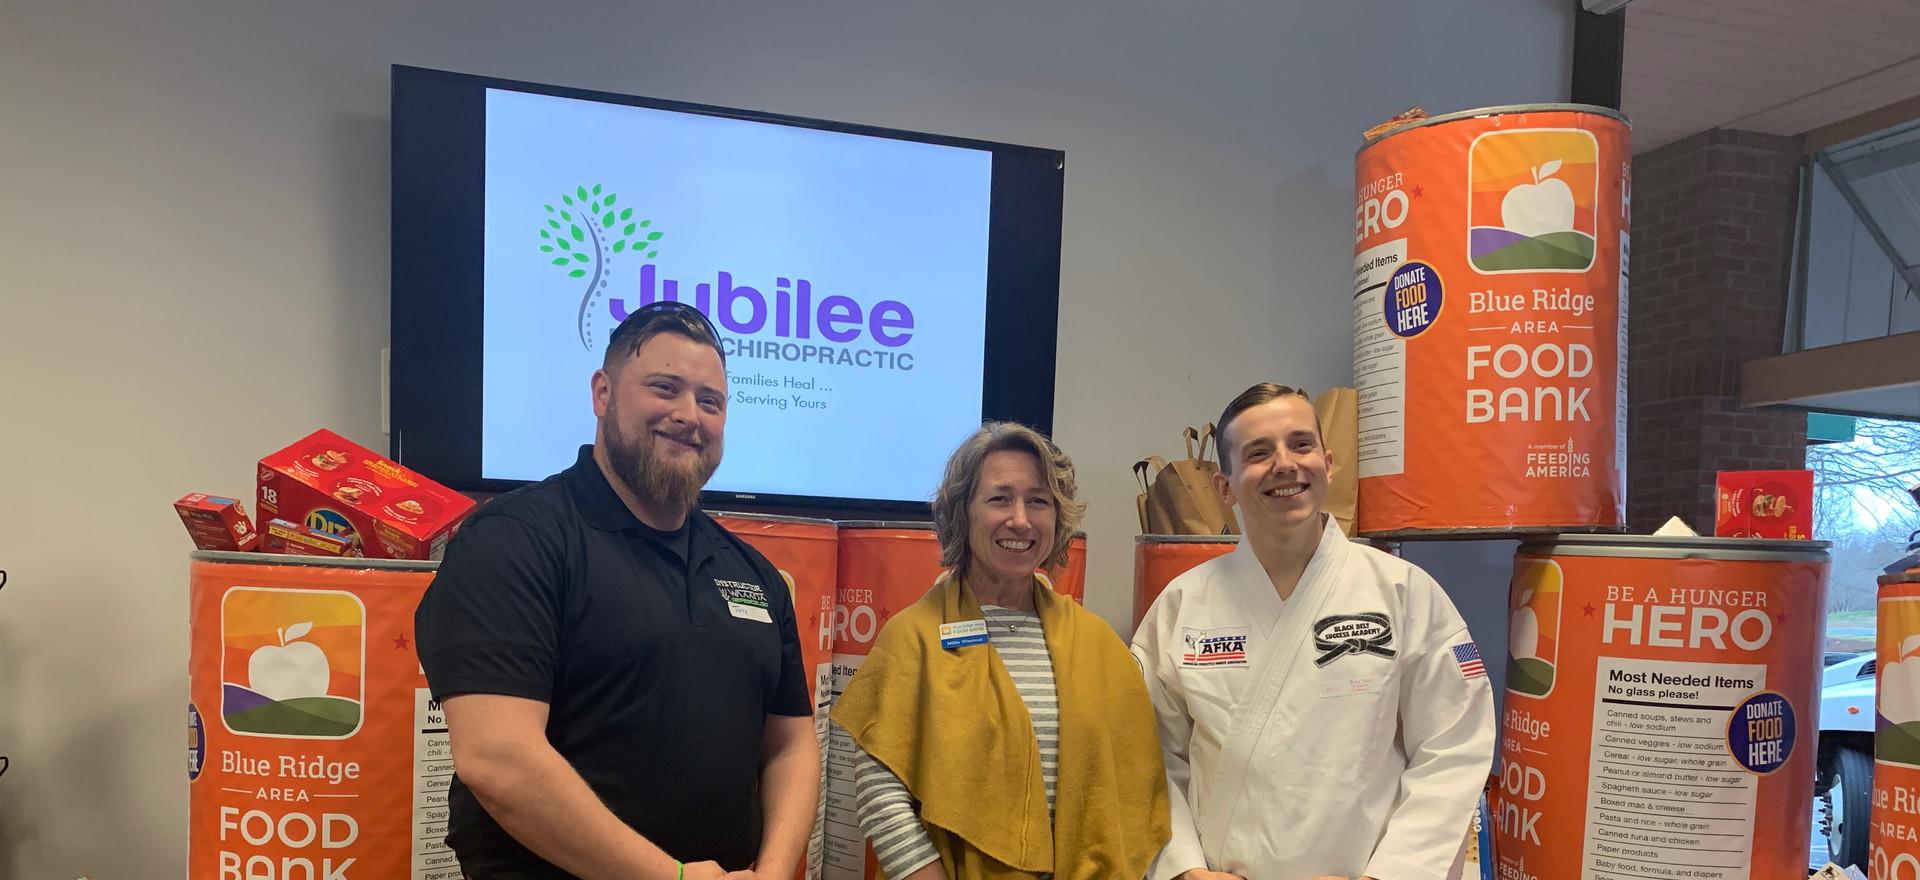 Jubilee Family Chiropractic 2020 Blue Ridge Food Drive. 036